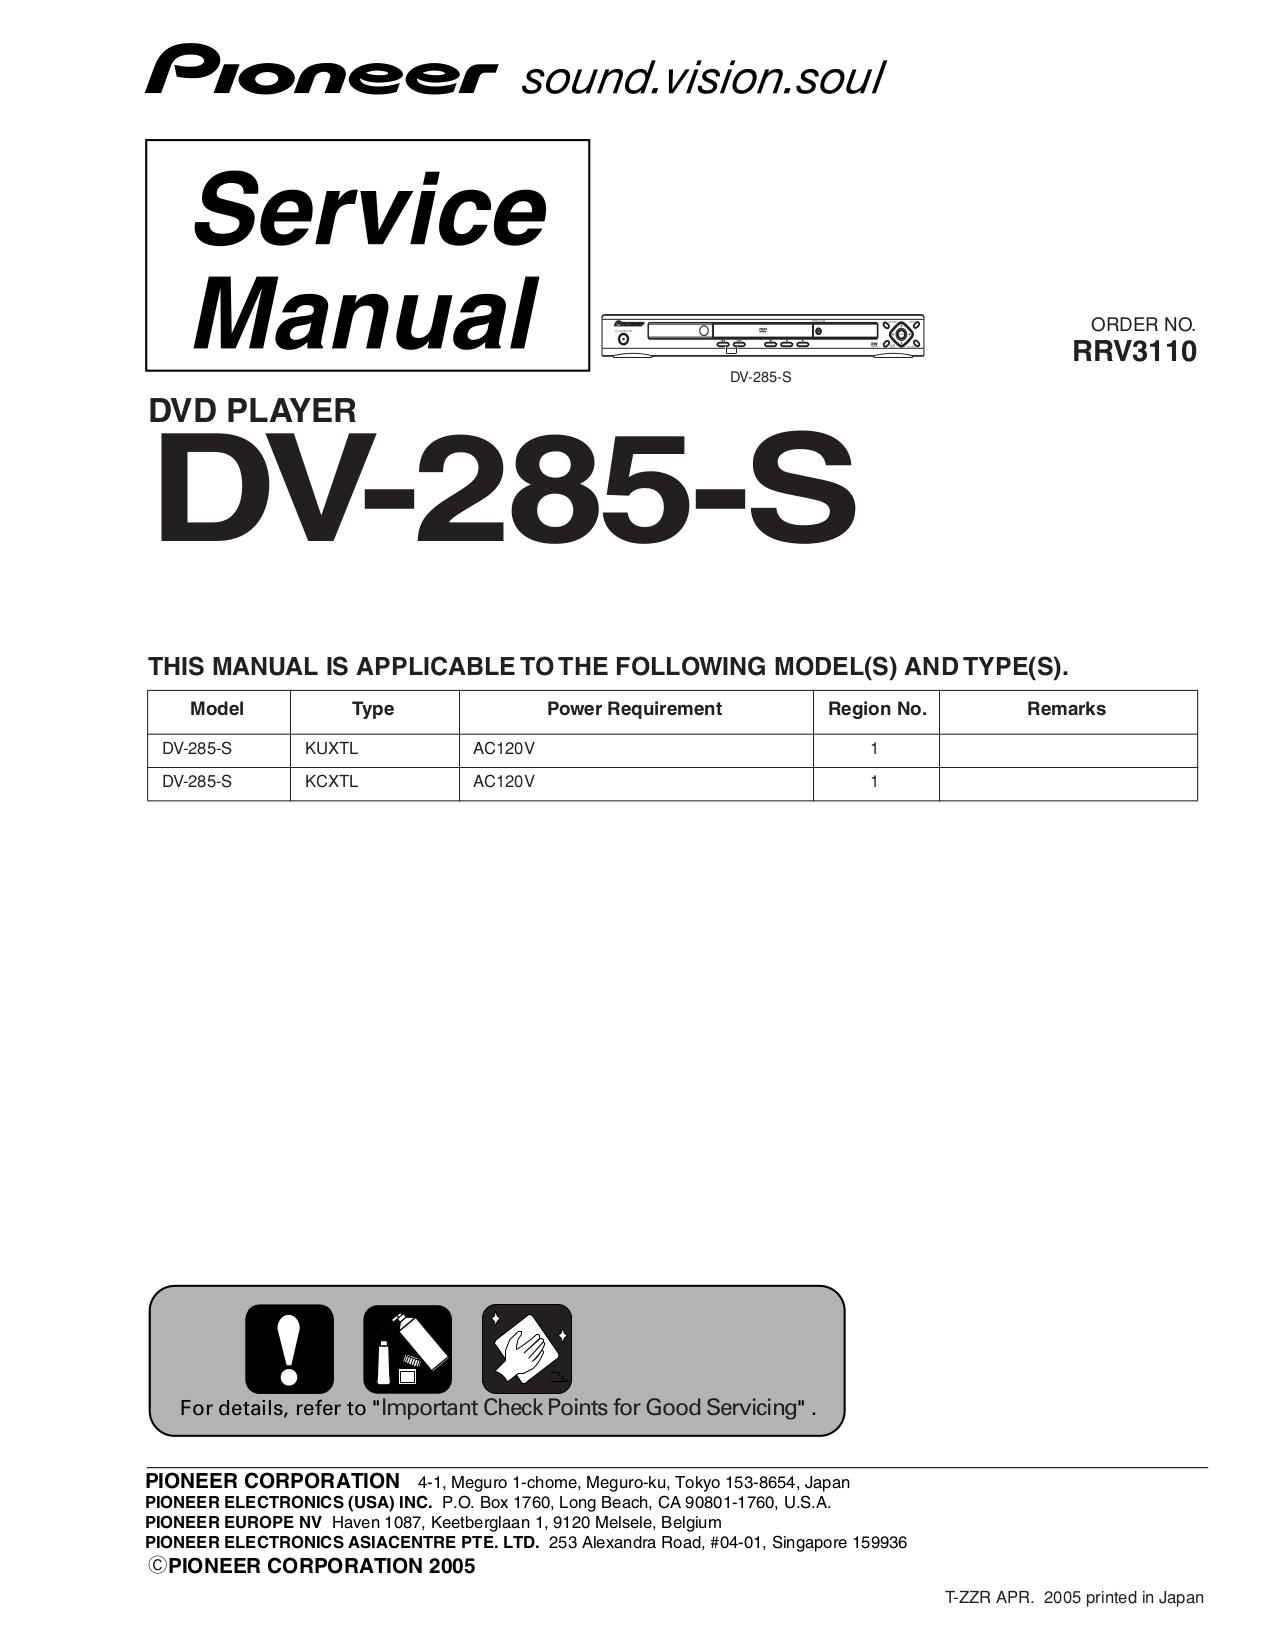 5hp19 Repair Manual Free Ebook Block Diagram Okifax50505300 Array Toshiba D Vr650 Rh Vpn993772541 Softether Net